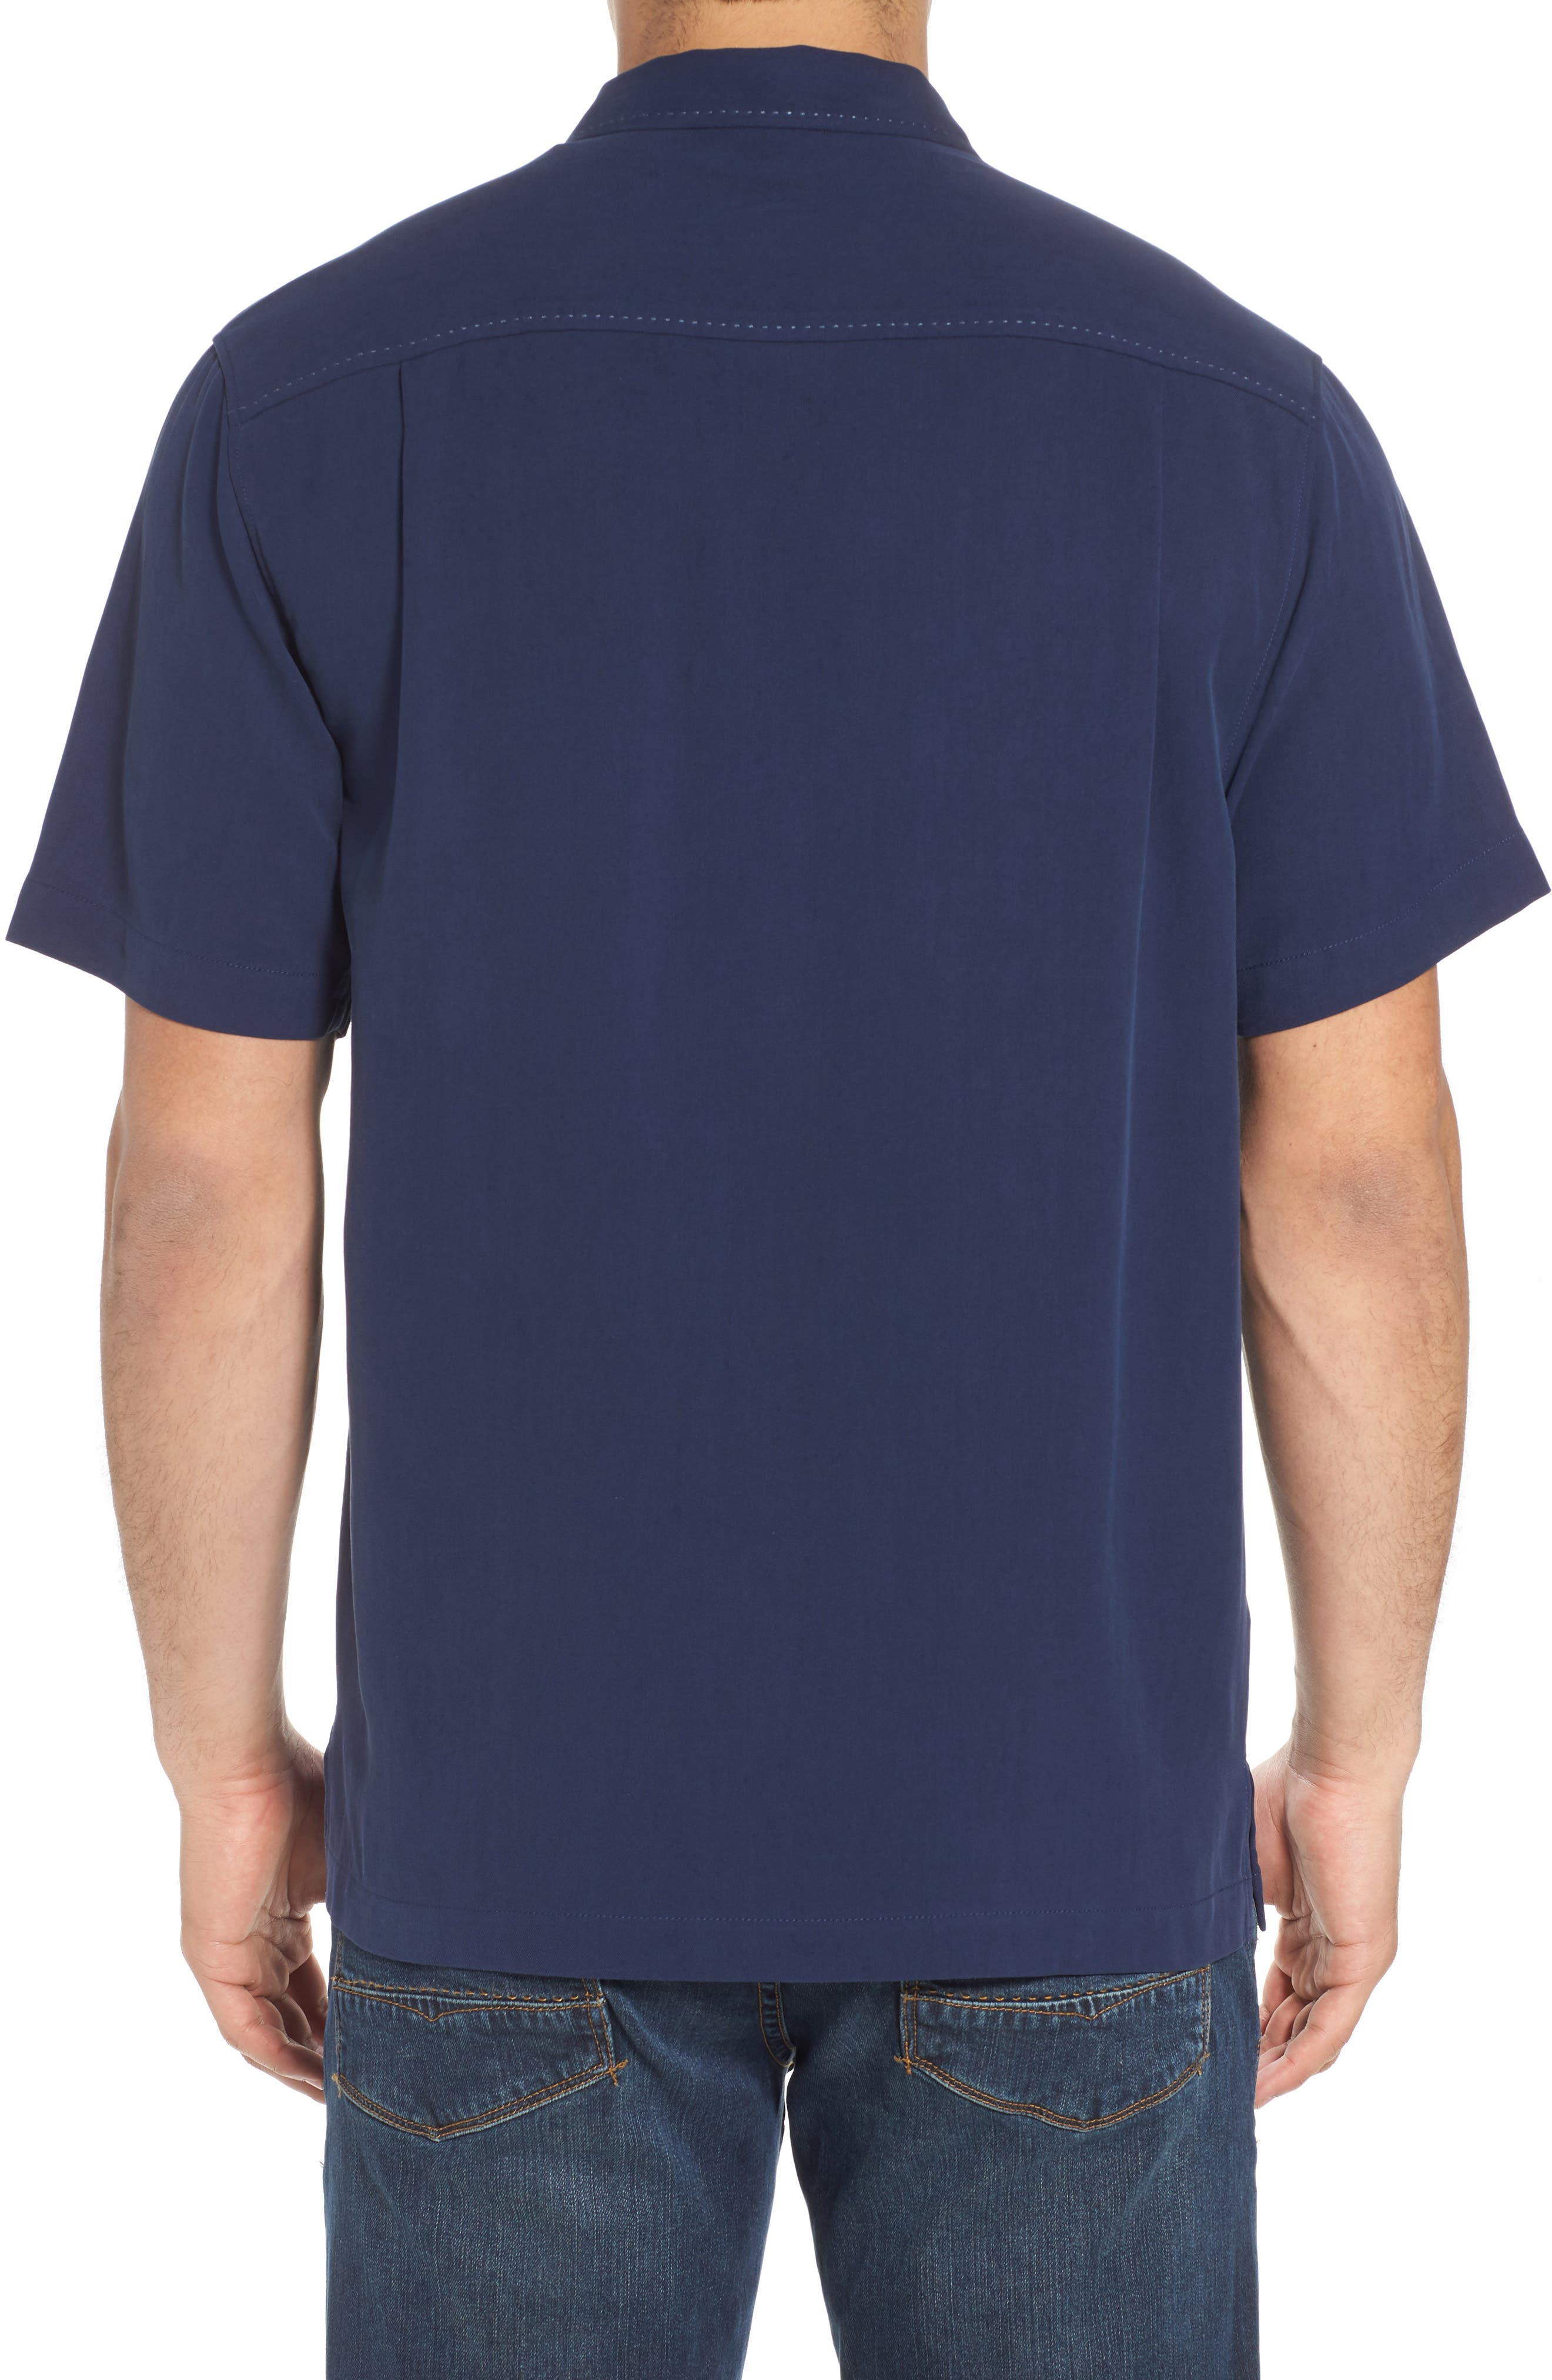 Catalina Silk Camp Shirt,                             Alternate thumbnail 2, color,                             NAVY